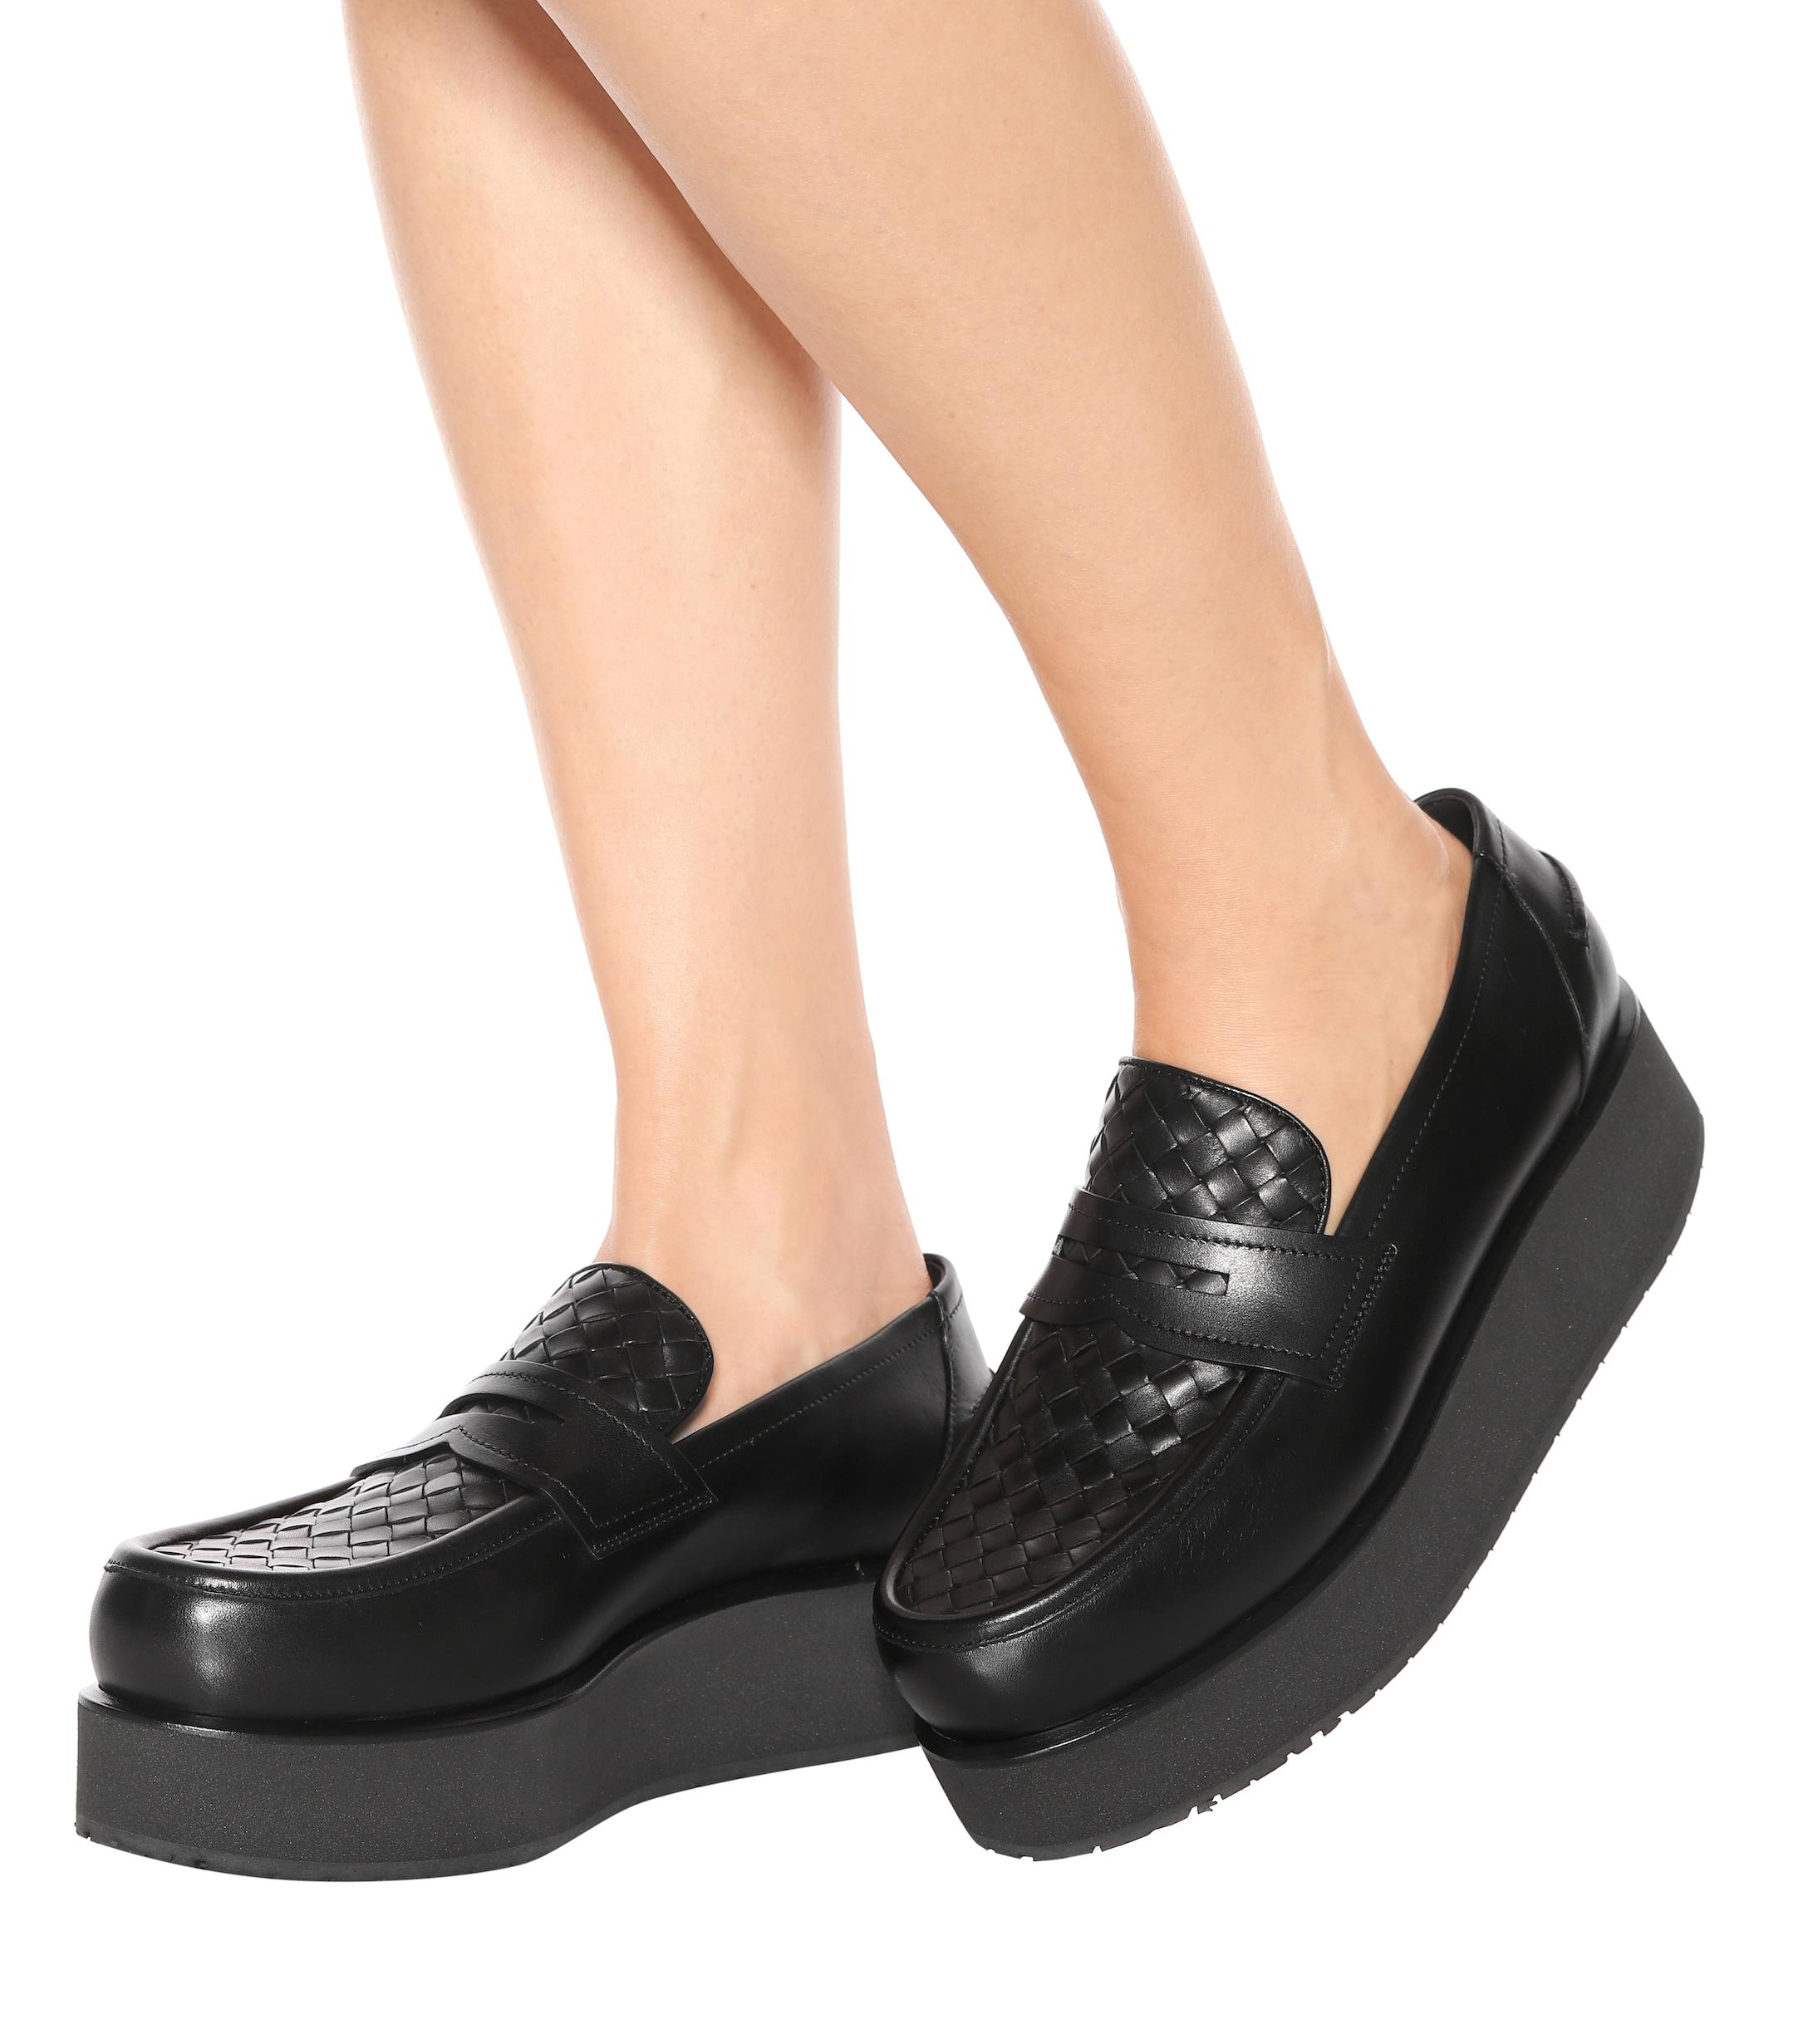 de6be353a86 Lyst - Bottega Veneta Plateau Leather Loafers in Black